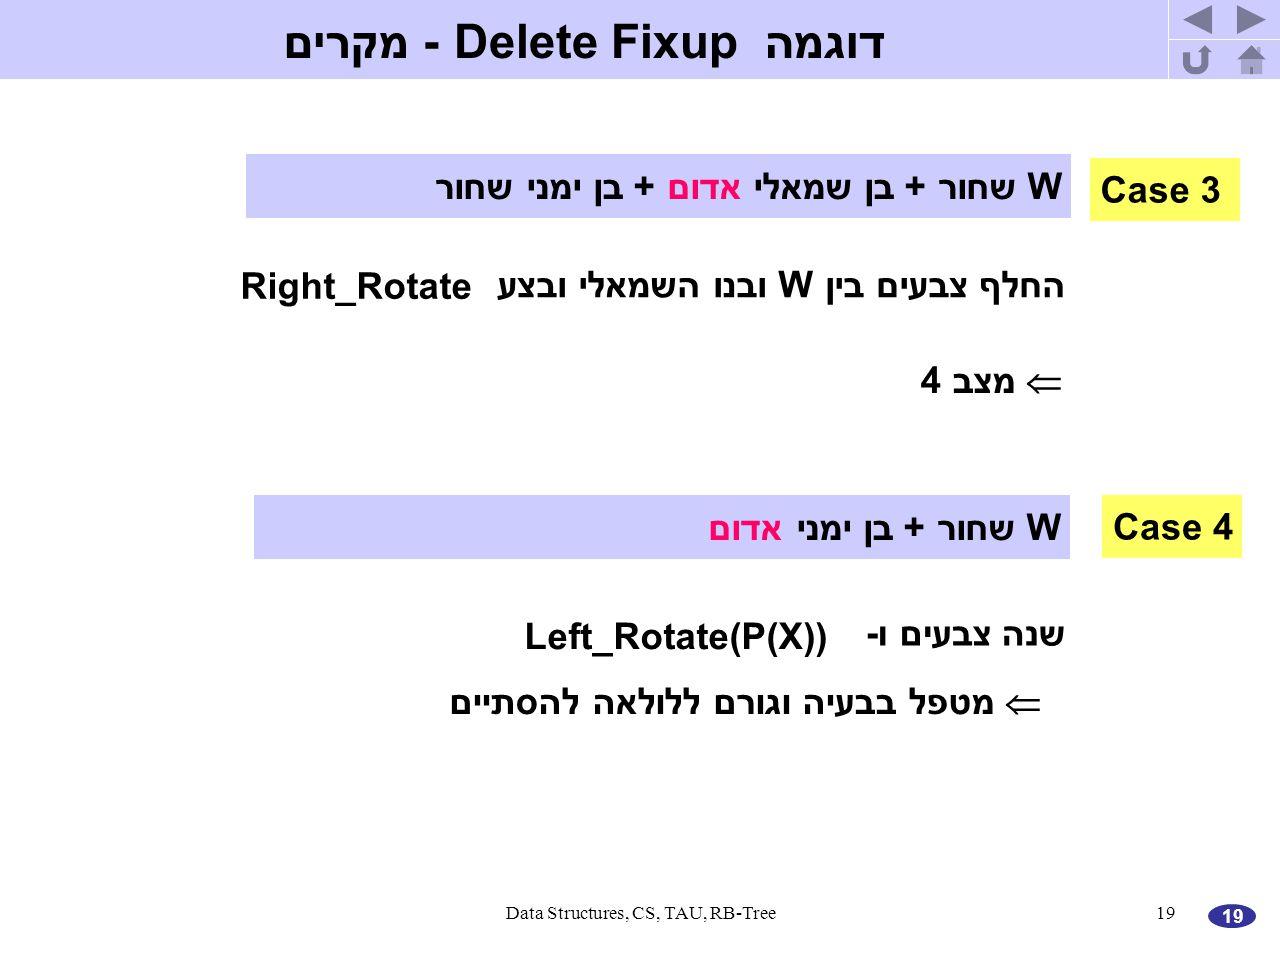 19 Data Structures, CS, TAU, RB-Tree19 דוגמה Delete Fixup - מקרים Case 4 W שחור + בן ימני אדום שנה צבעים ו- Left_Rotate(P(X))  מטפל בבעיה וגורם ללולאה להסתיים Case 3 W שחור + בן שמאלי אדום + בן ימני שחור החלף צבעים בין W ובנו השמאלי ובצע Right_Rotate  מצב 4